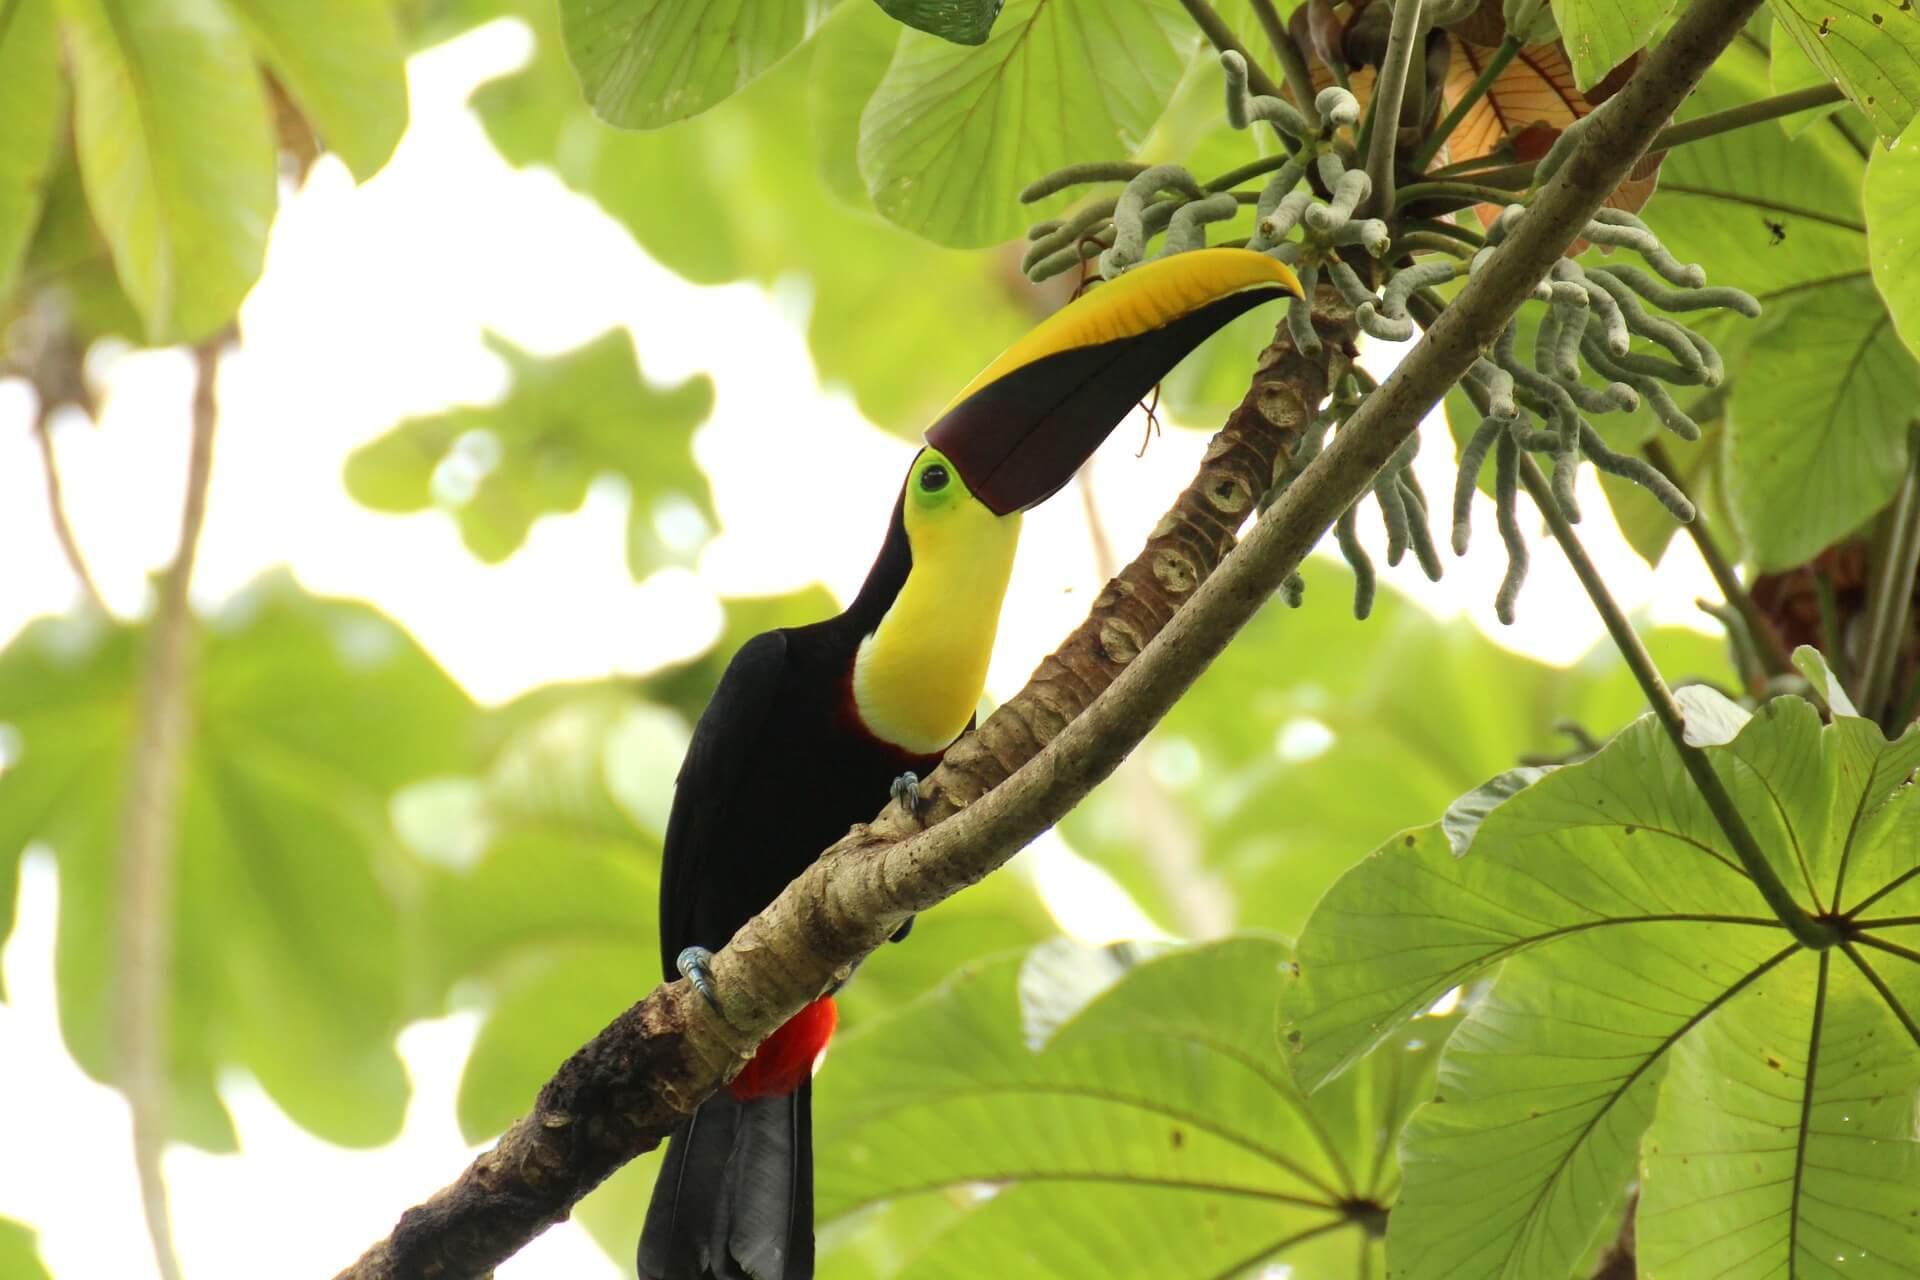 toucan-1972557_1920